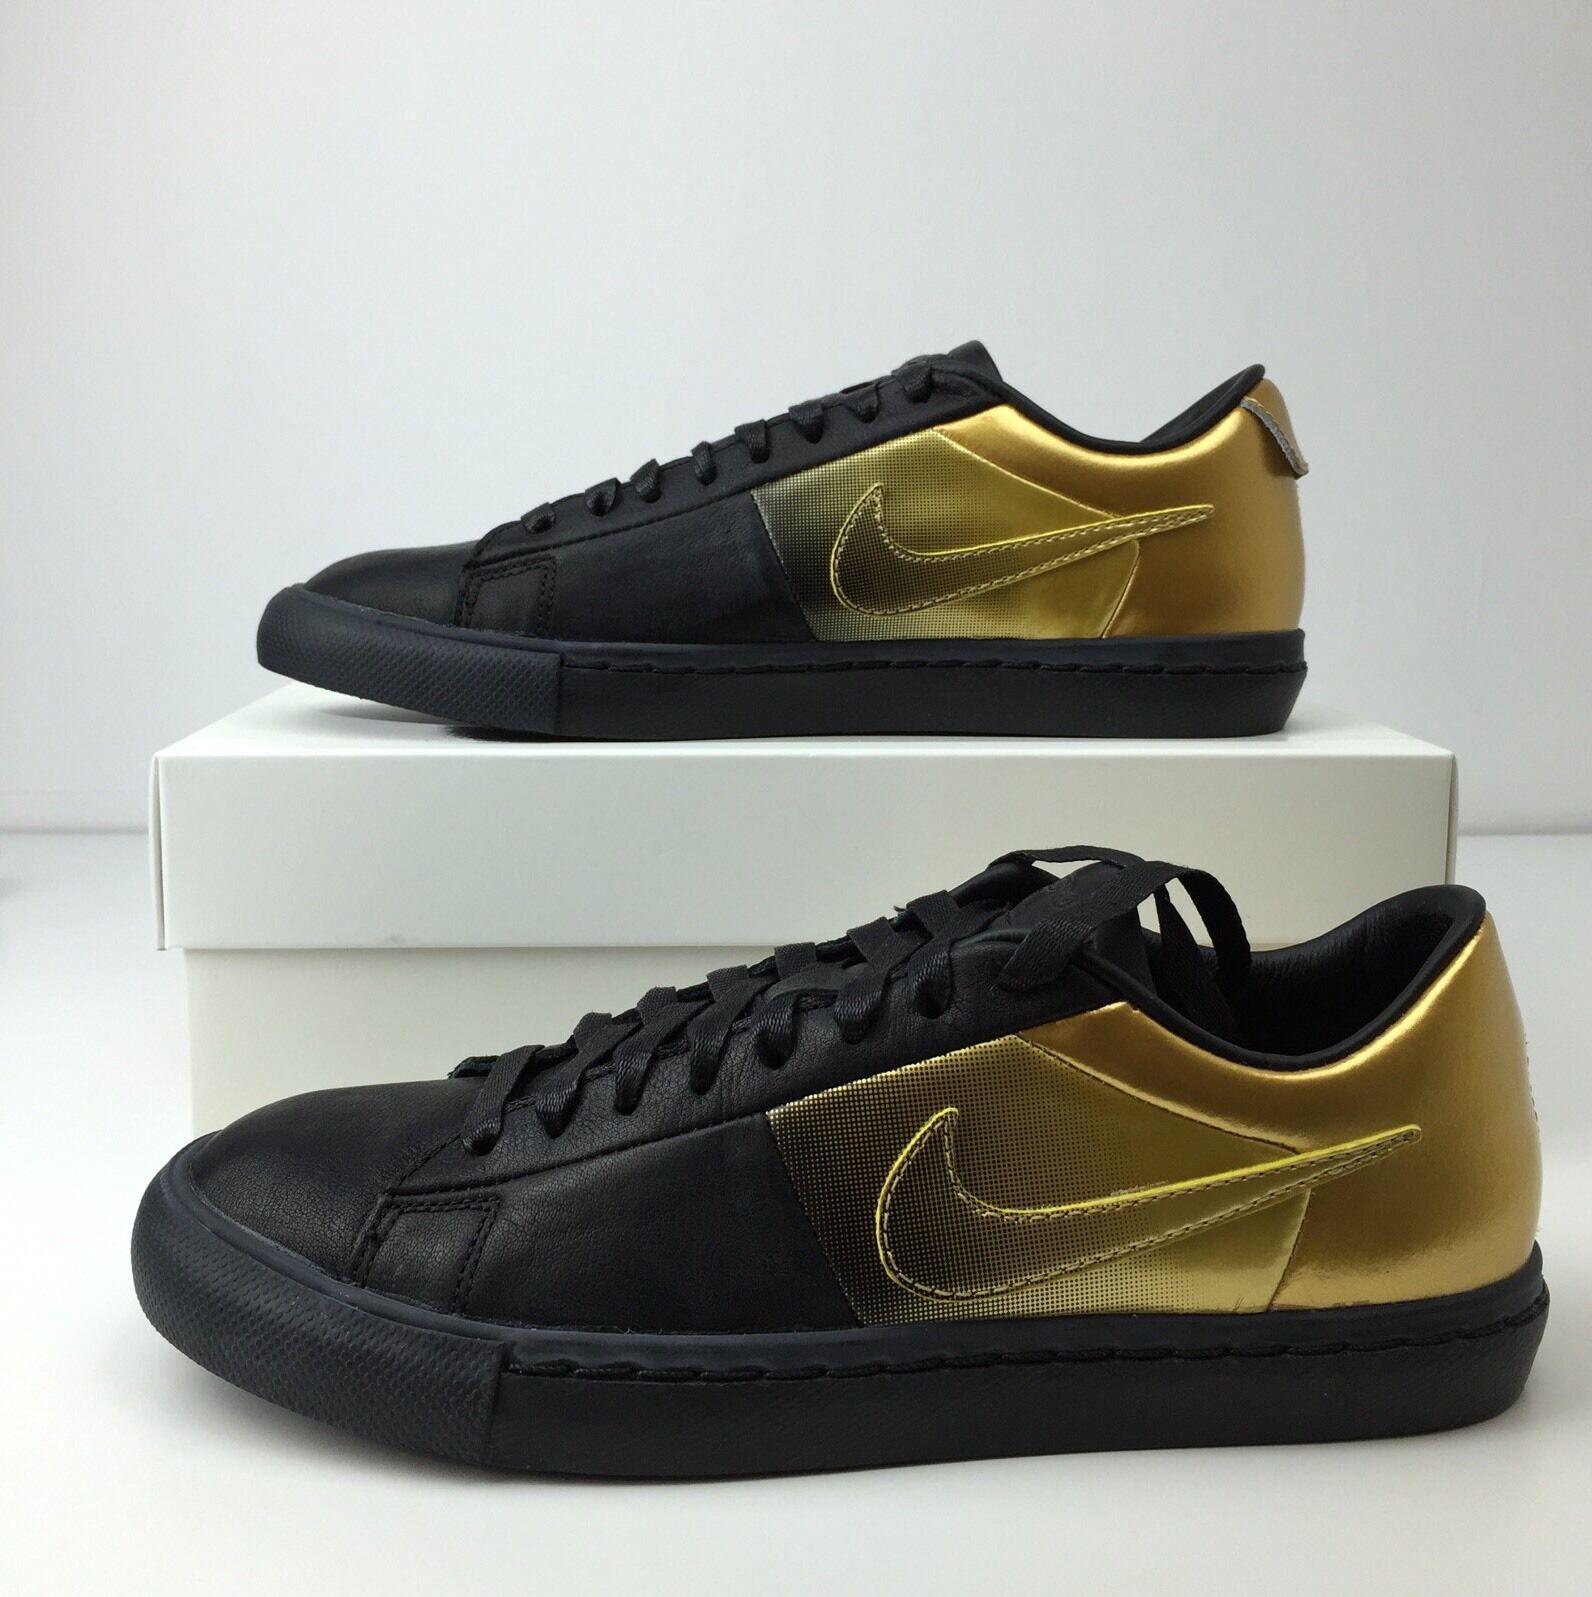 Nike Blazer bajo Sp Pedro formadores por Pedro Lourenco Para Mujer Nike X Zapatos